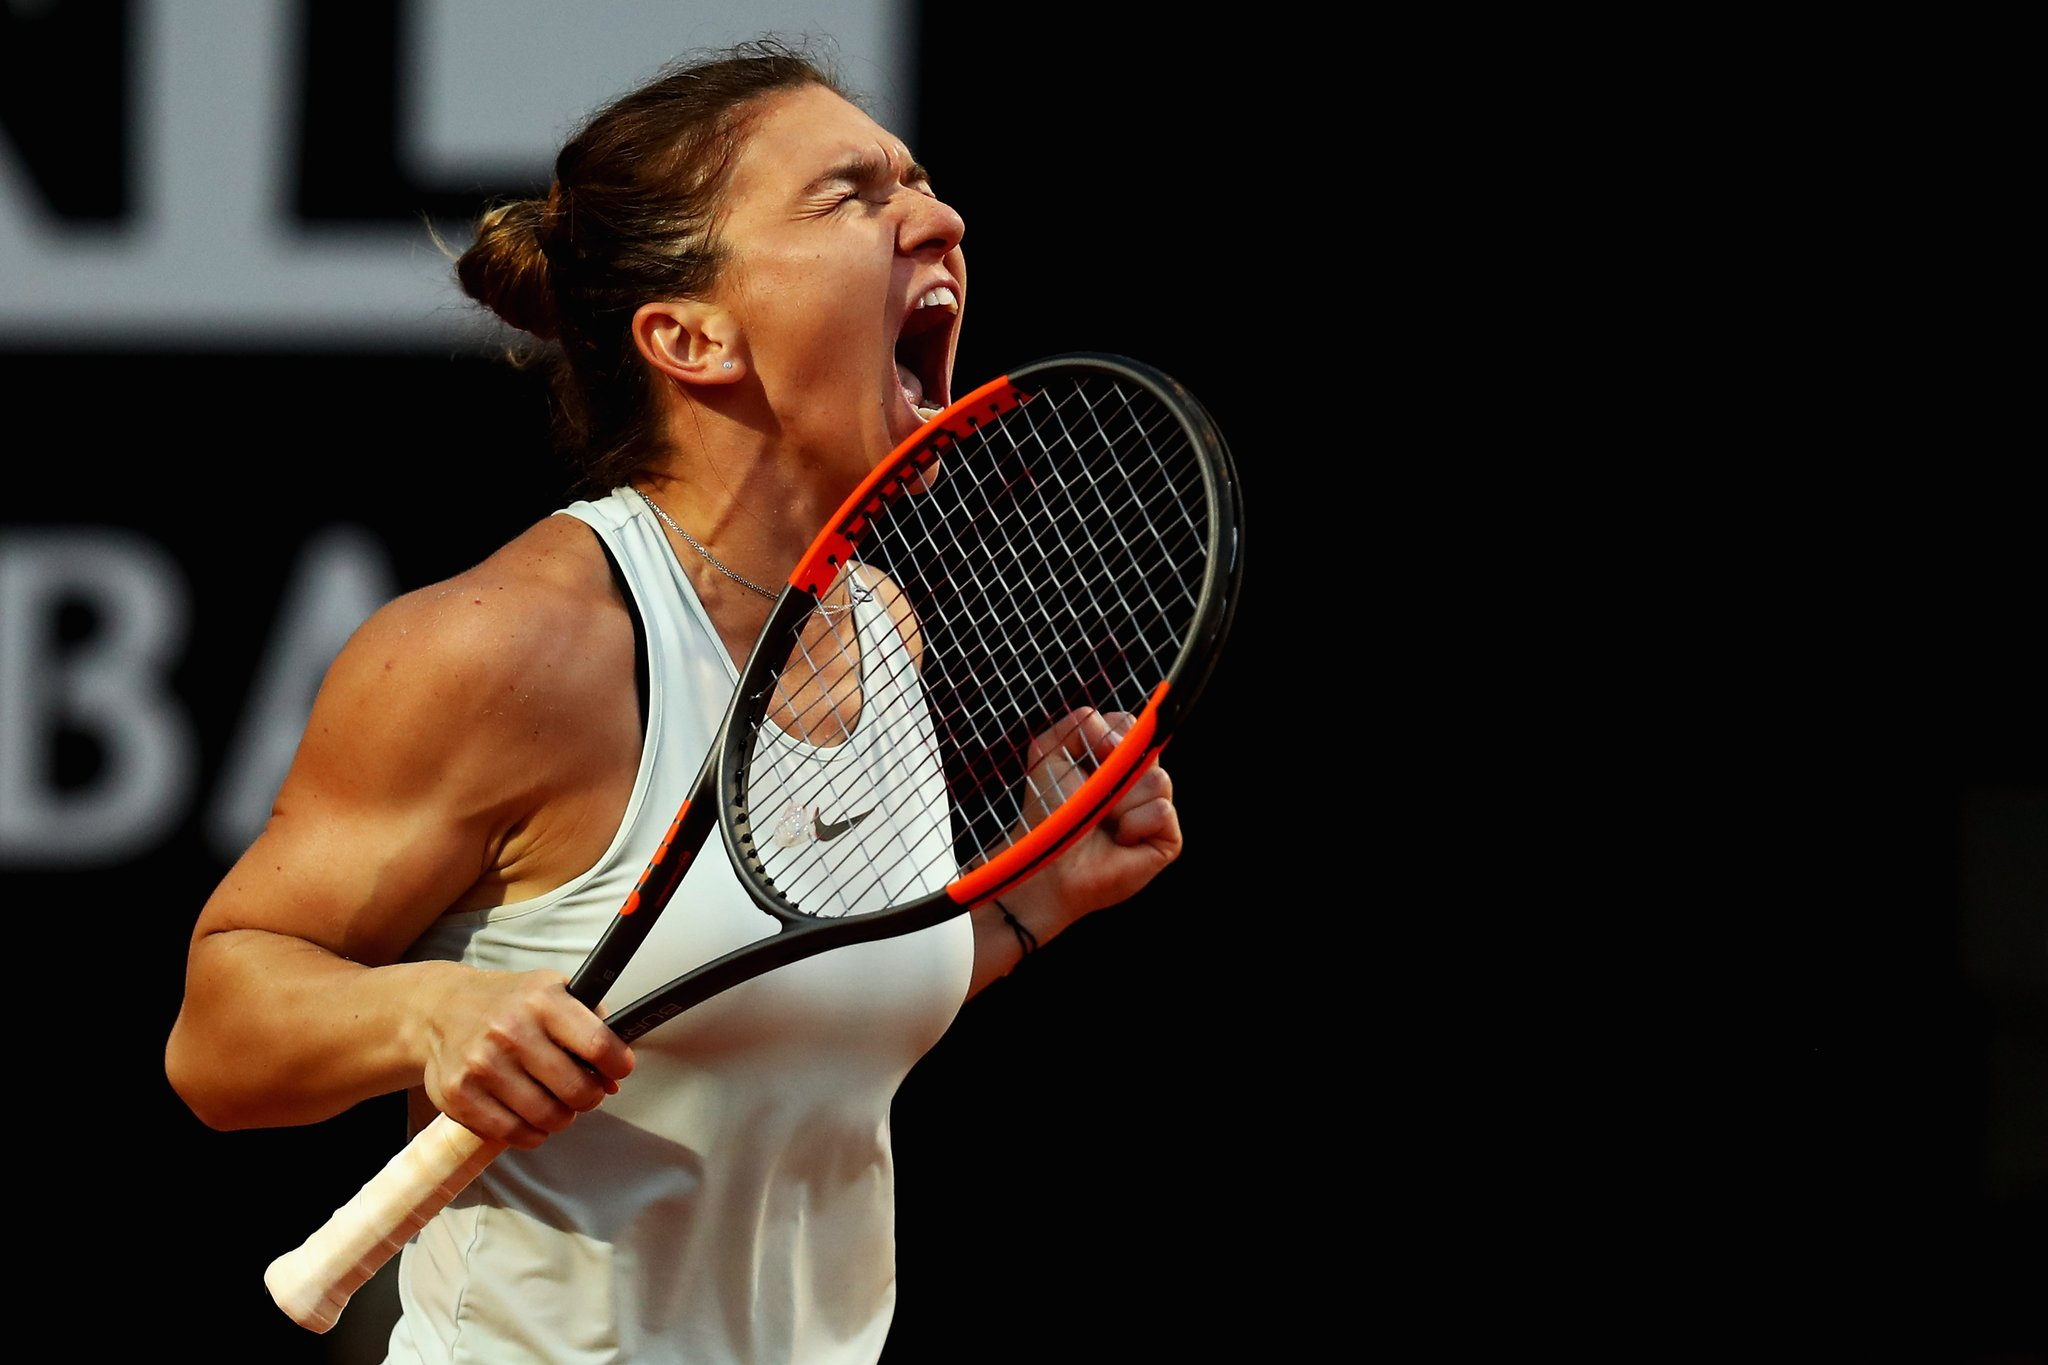 womens singles rankings released - HD1200×800